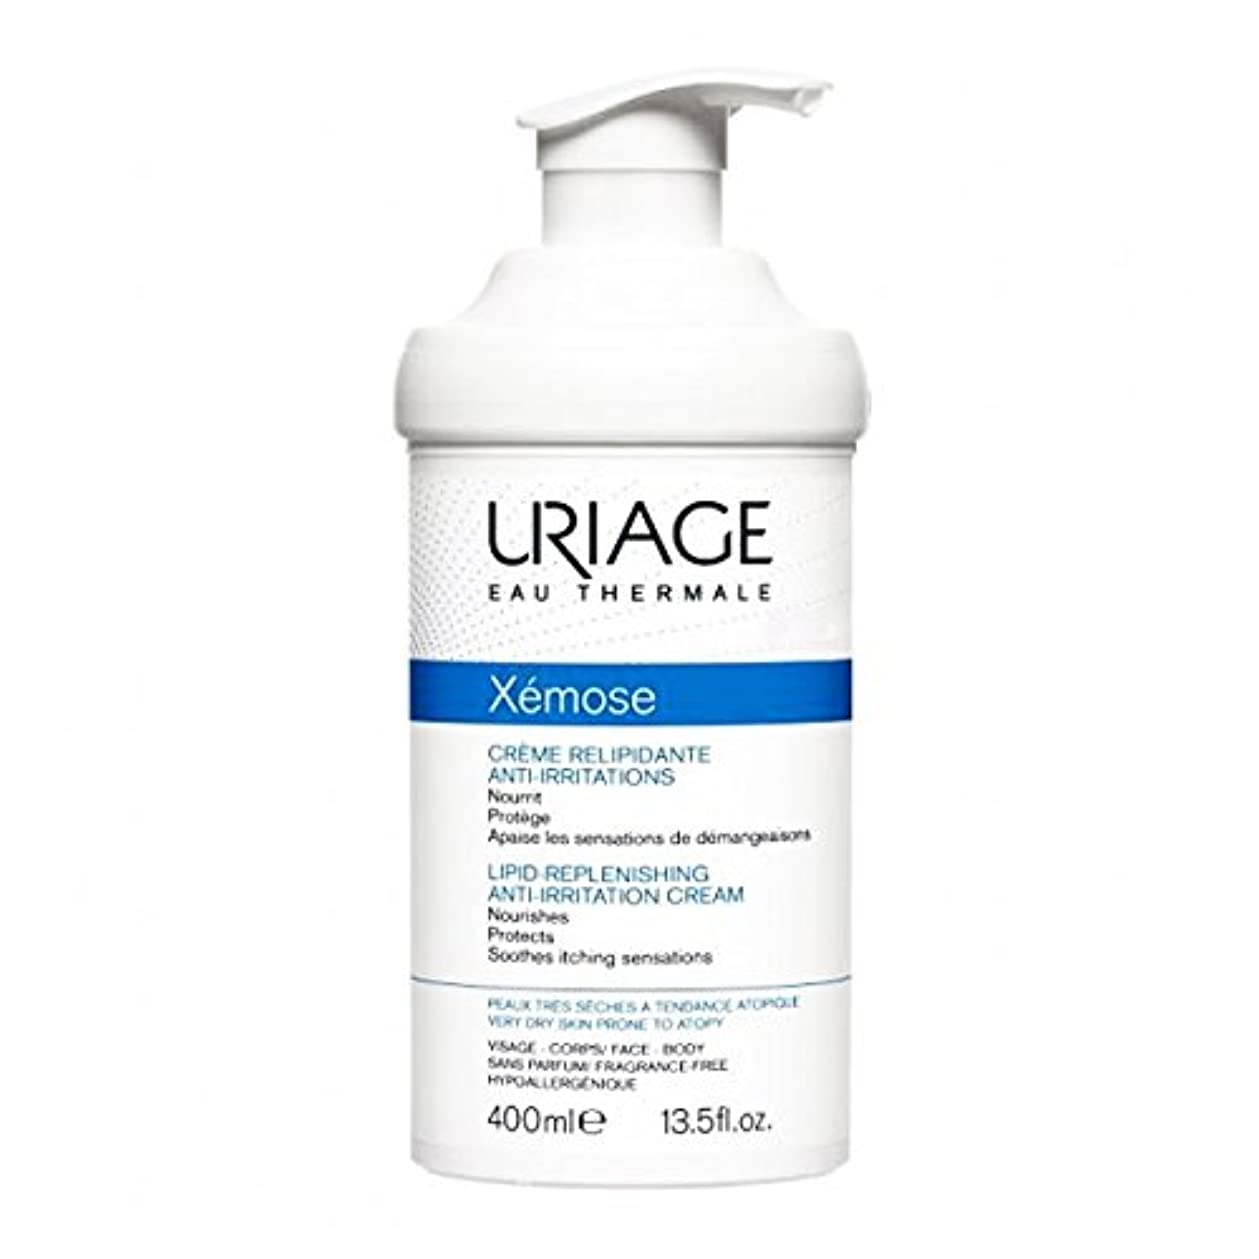 避難女優宝石Uriage X駑ose Universal Emollient Cream 400ml [並行輸入品]